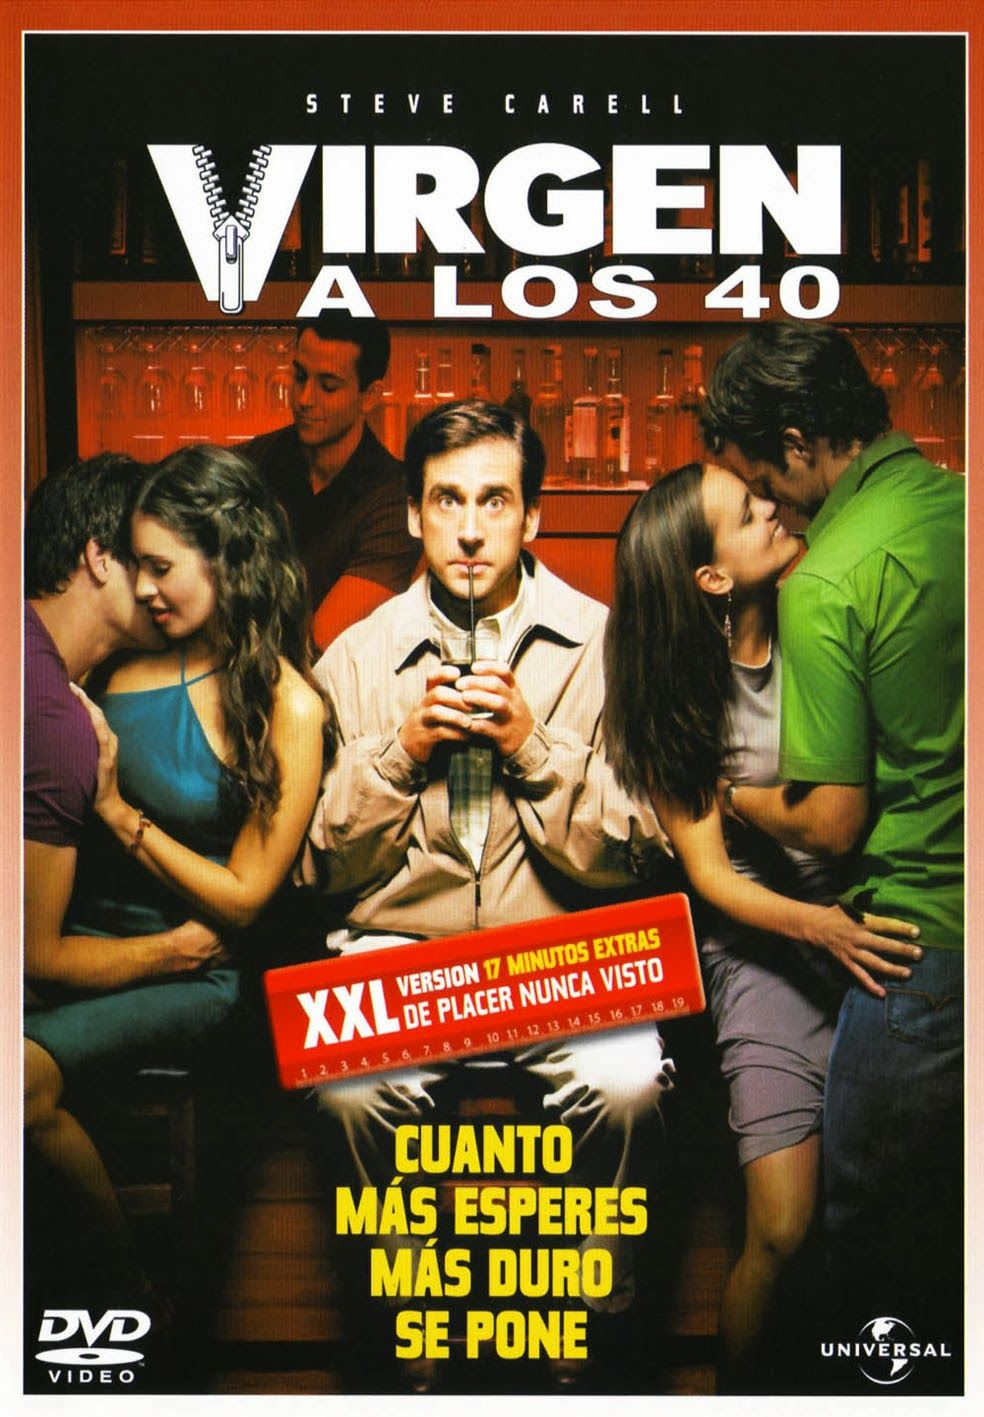 The 40 Year Old Virgin 2005 Virgen A Los 40 40 Year Old Virgin Full Movies Online Free Free Movies Online